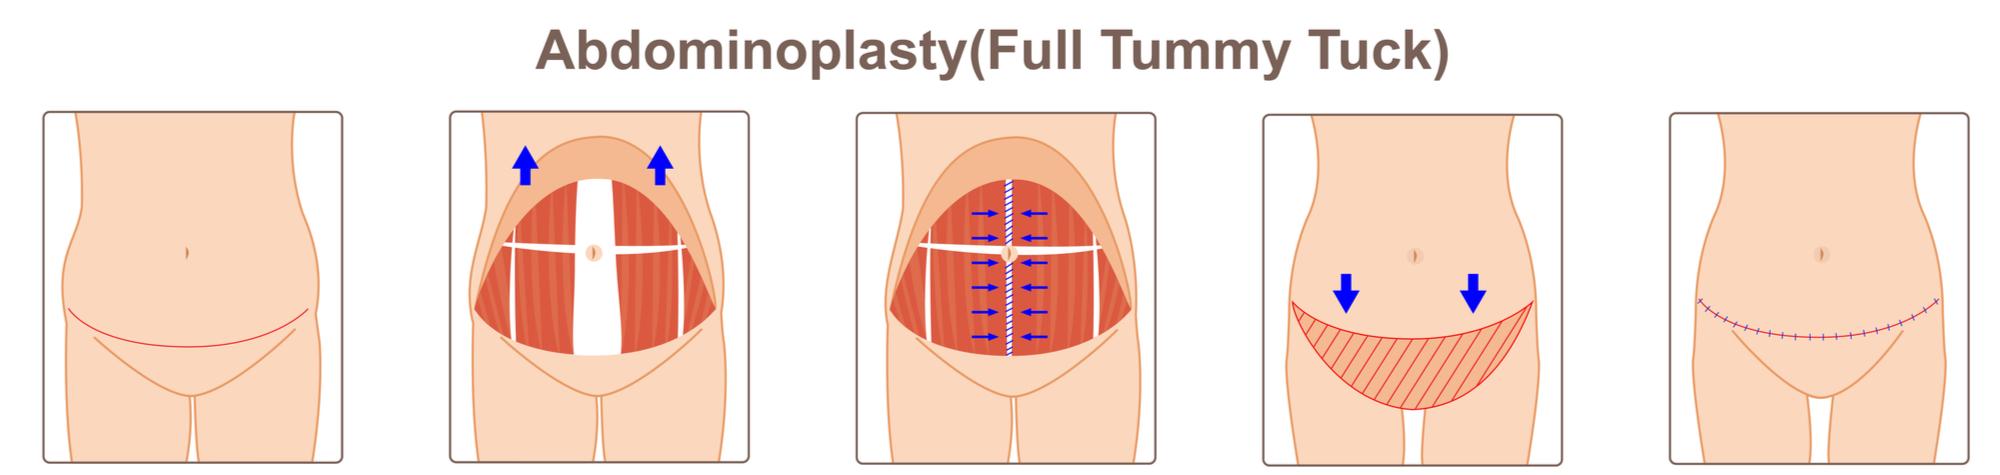 Abdominoplasty Tummy Tuck diagram